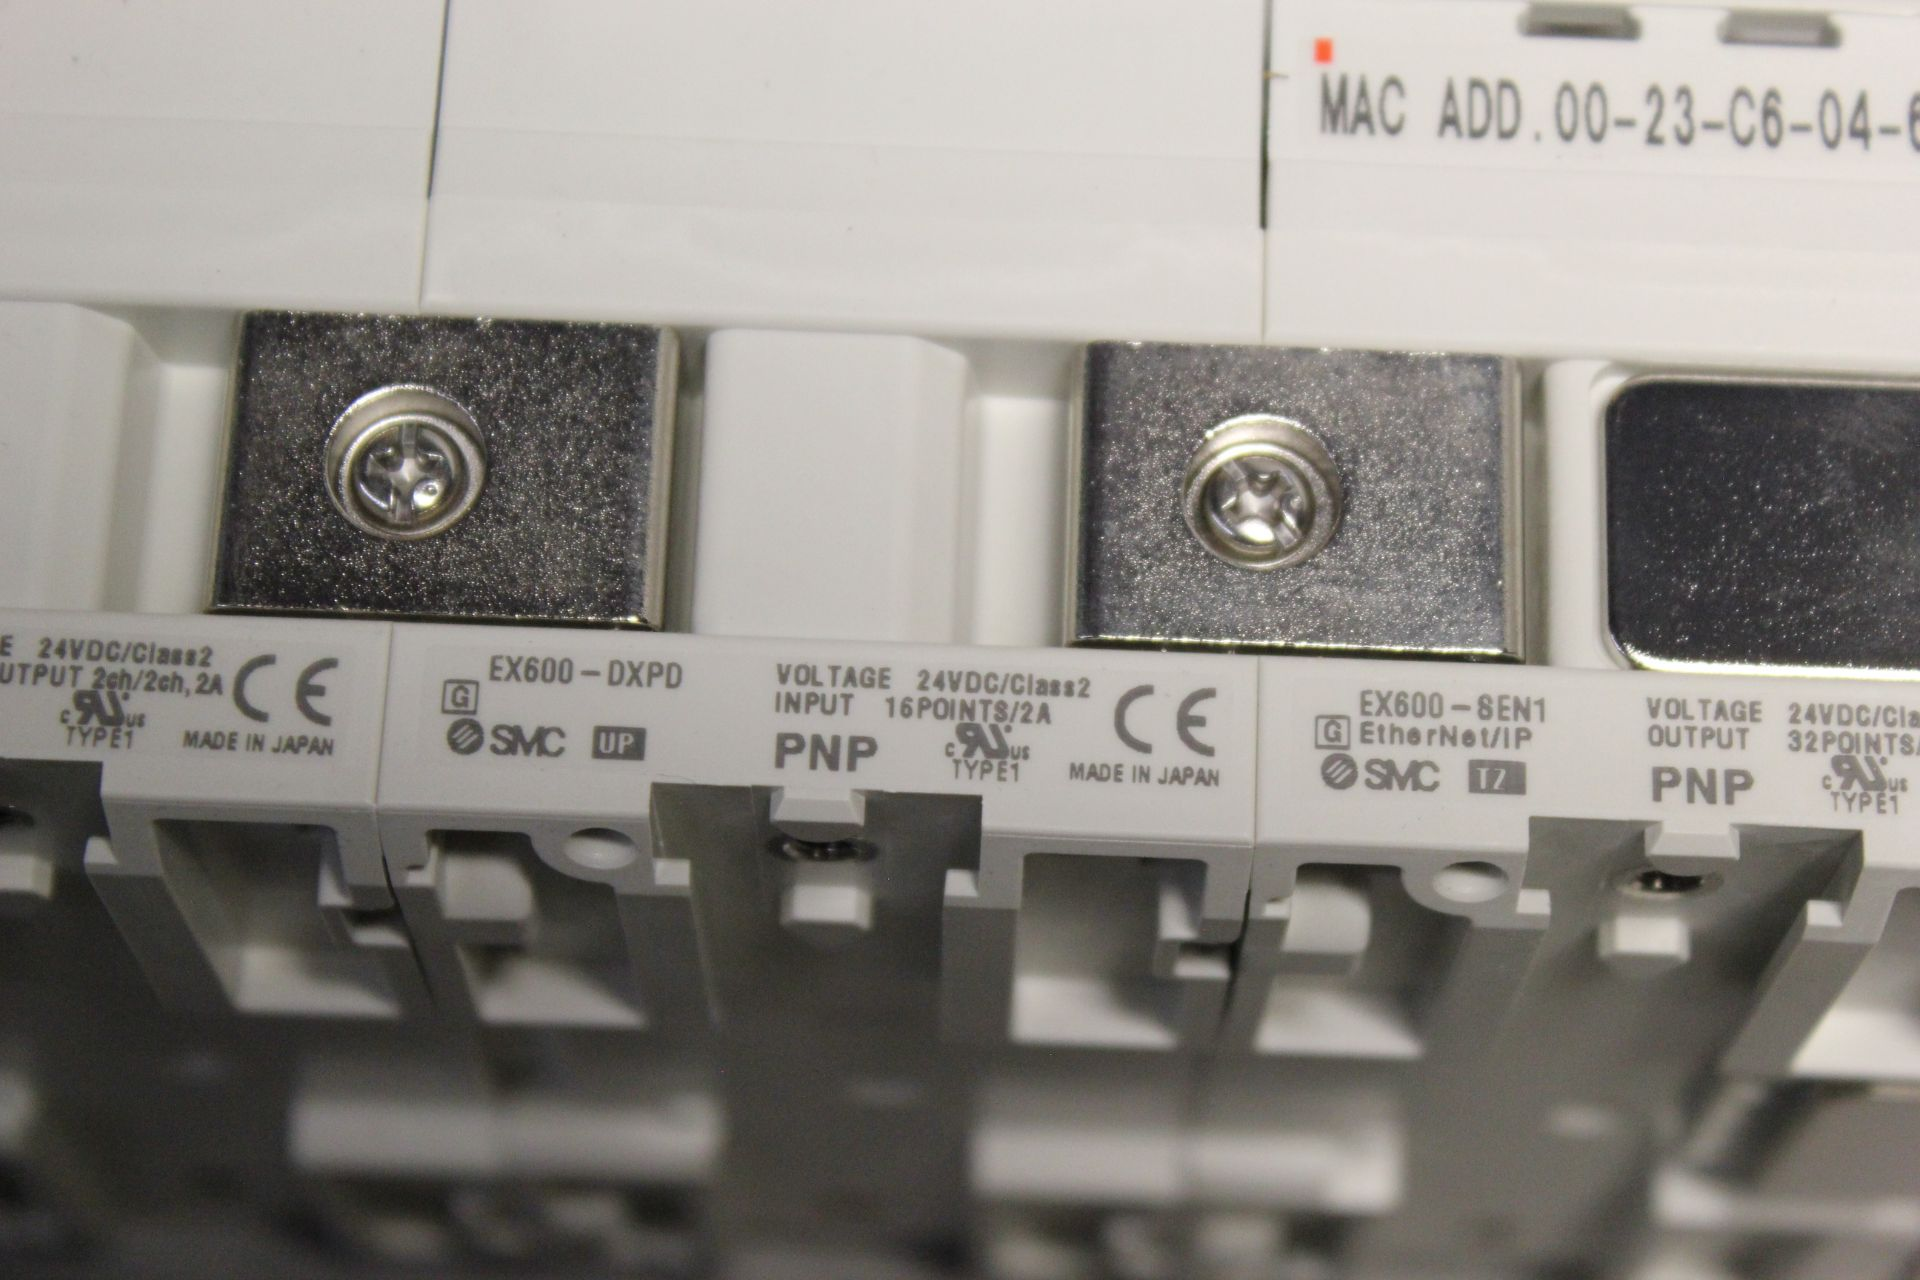 NEW SMC MANIFOLD WITH SOLENOID VALVES, ETHERNET/IP I/O - Image 7 of 8